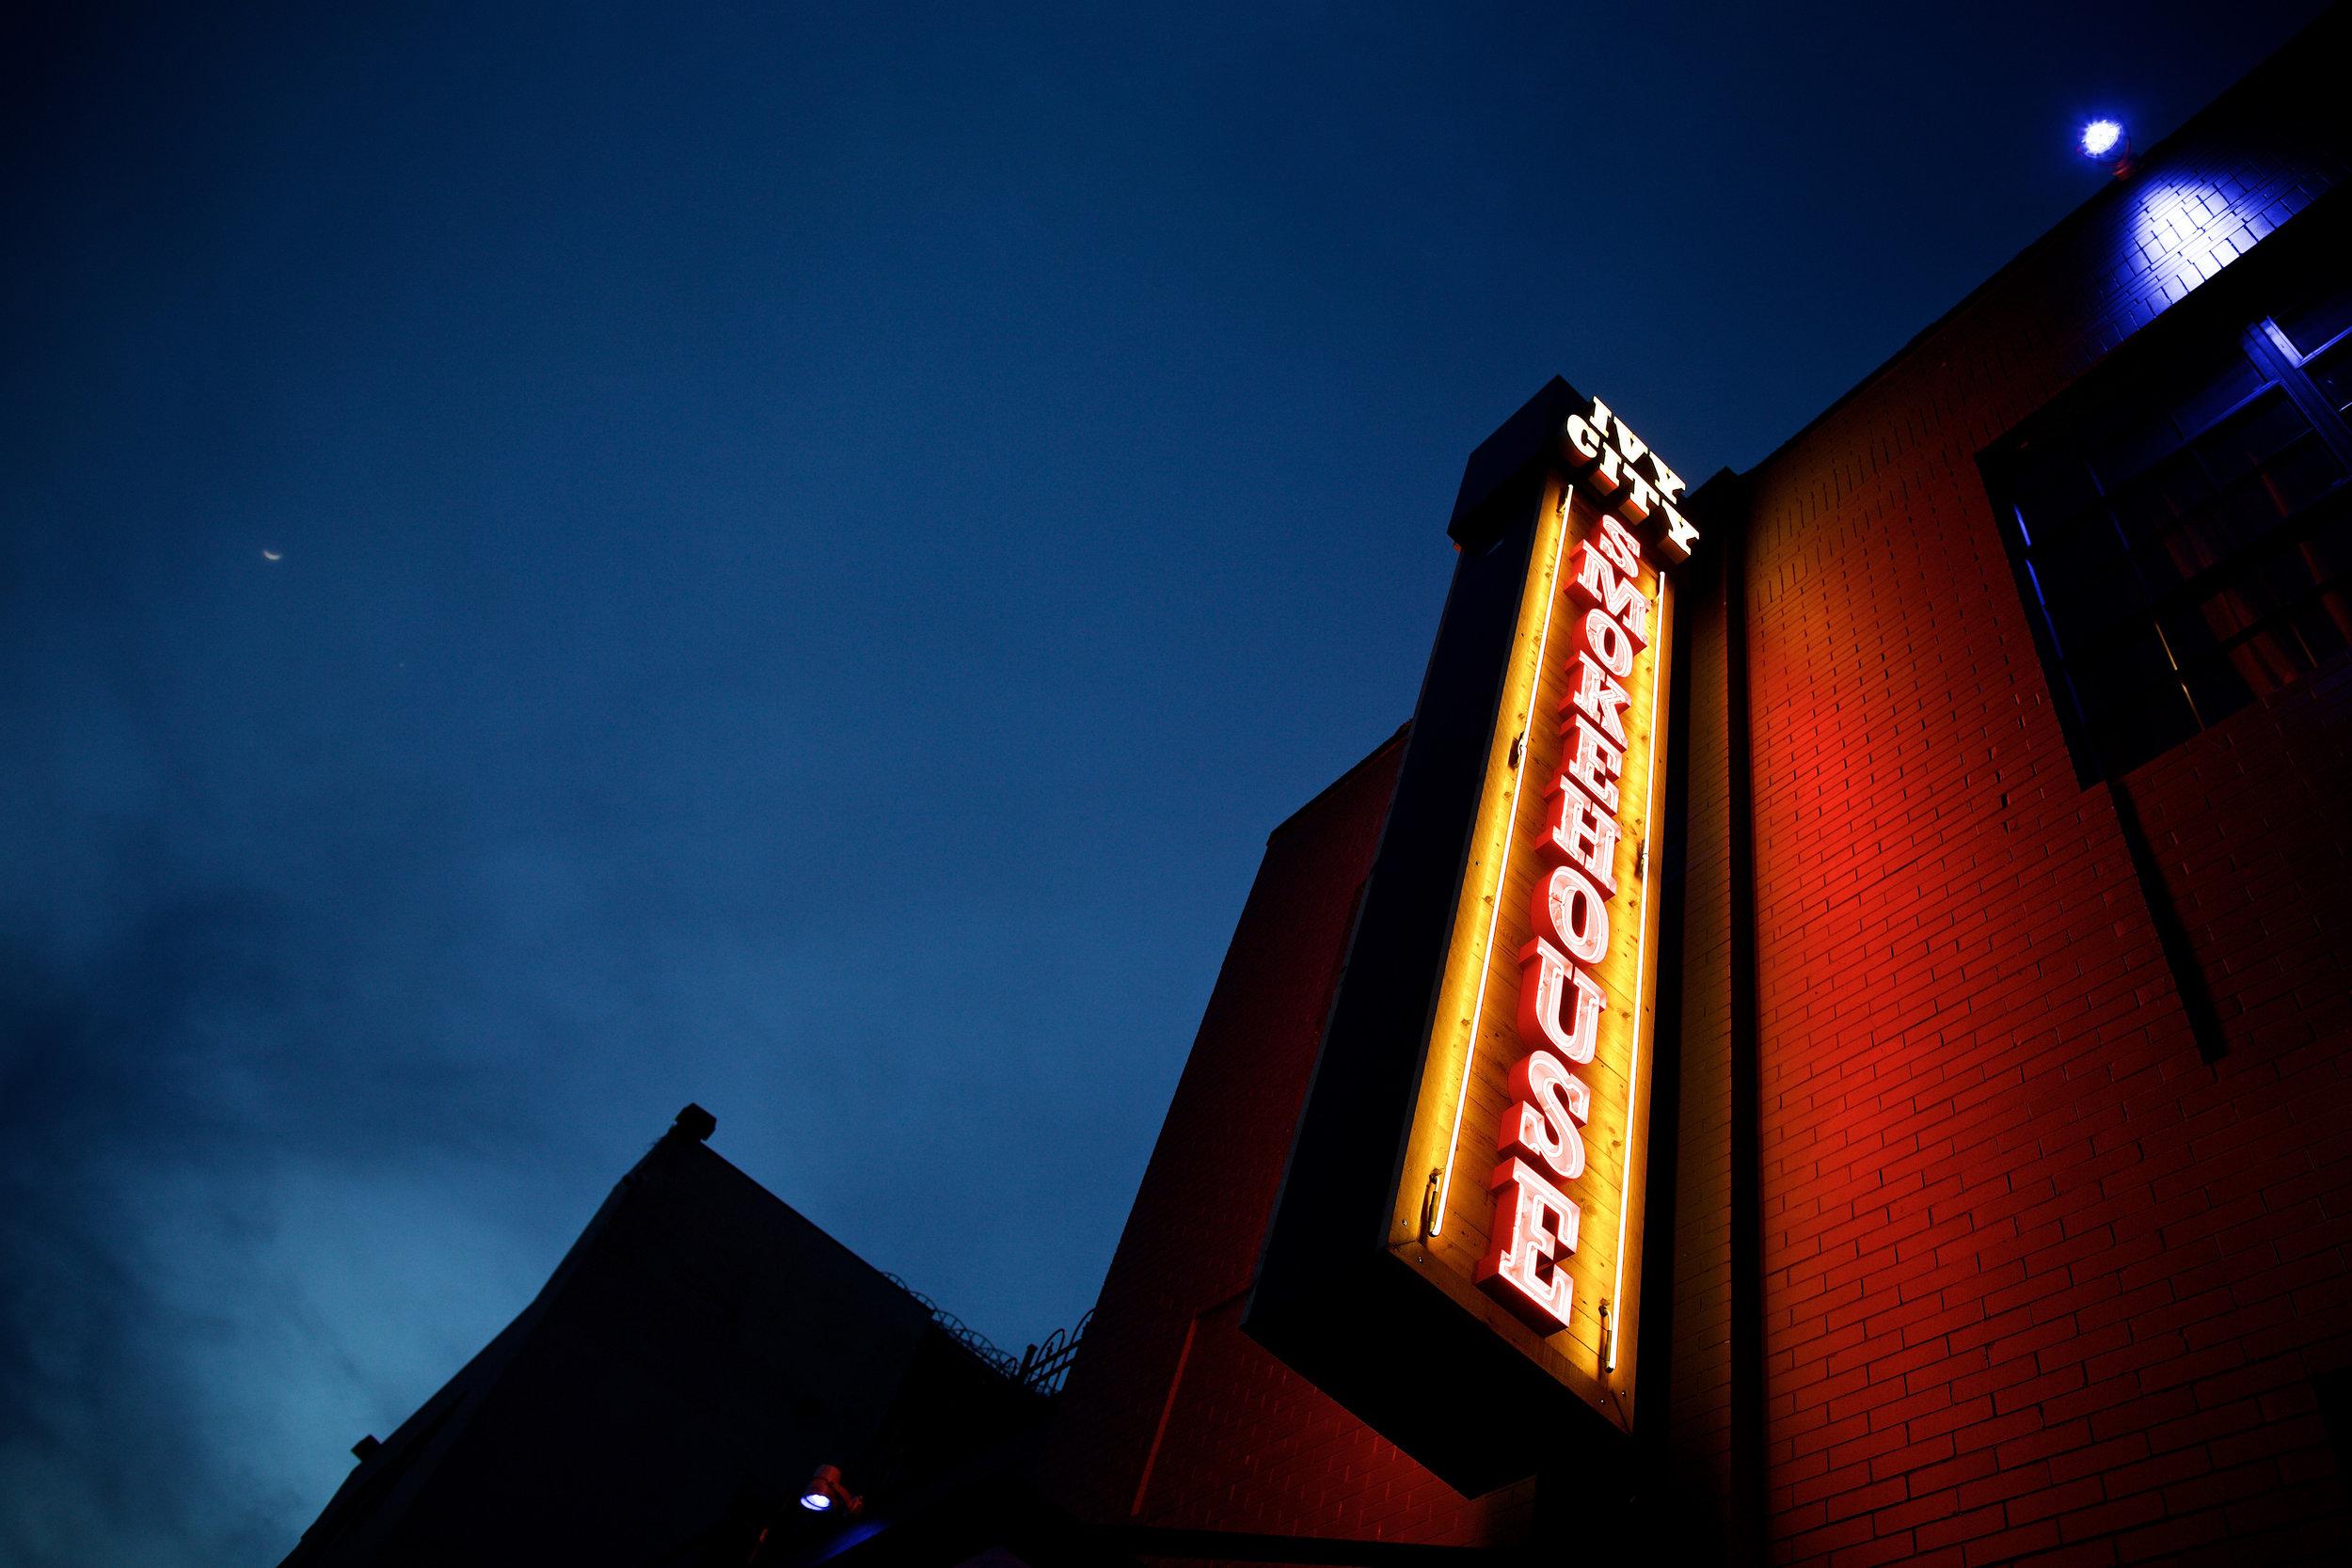 The Tavern at Ivy City Smokehouse